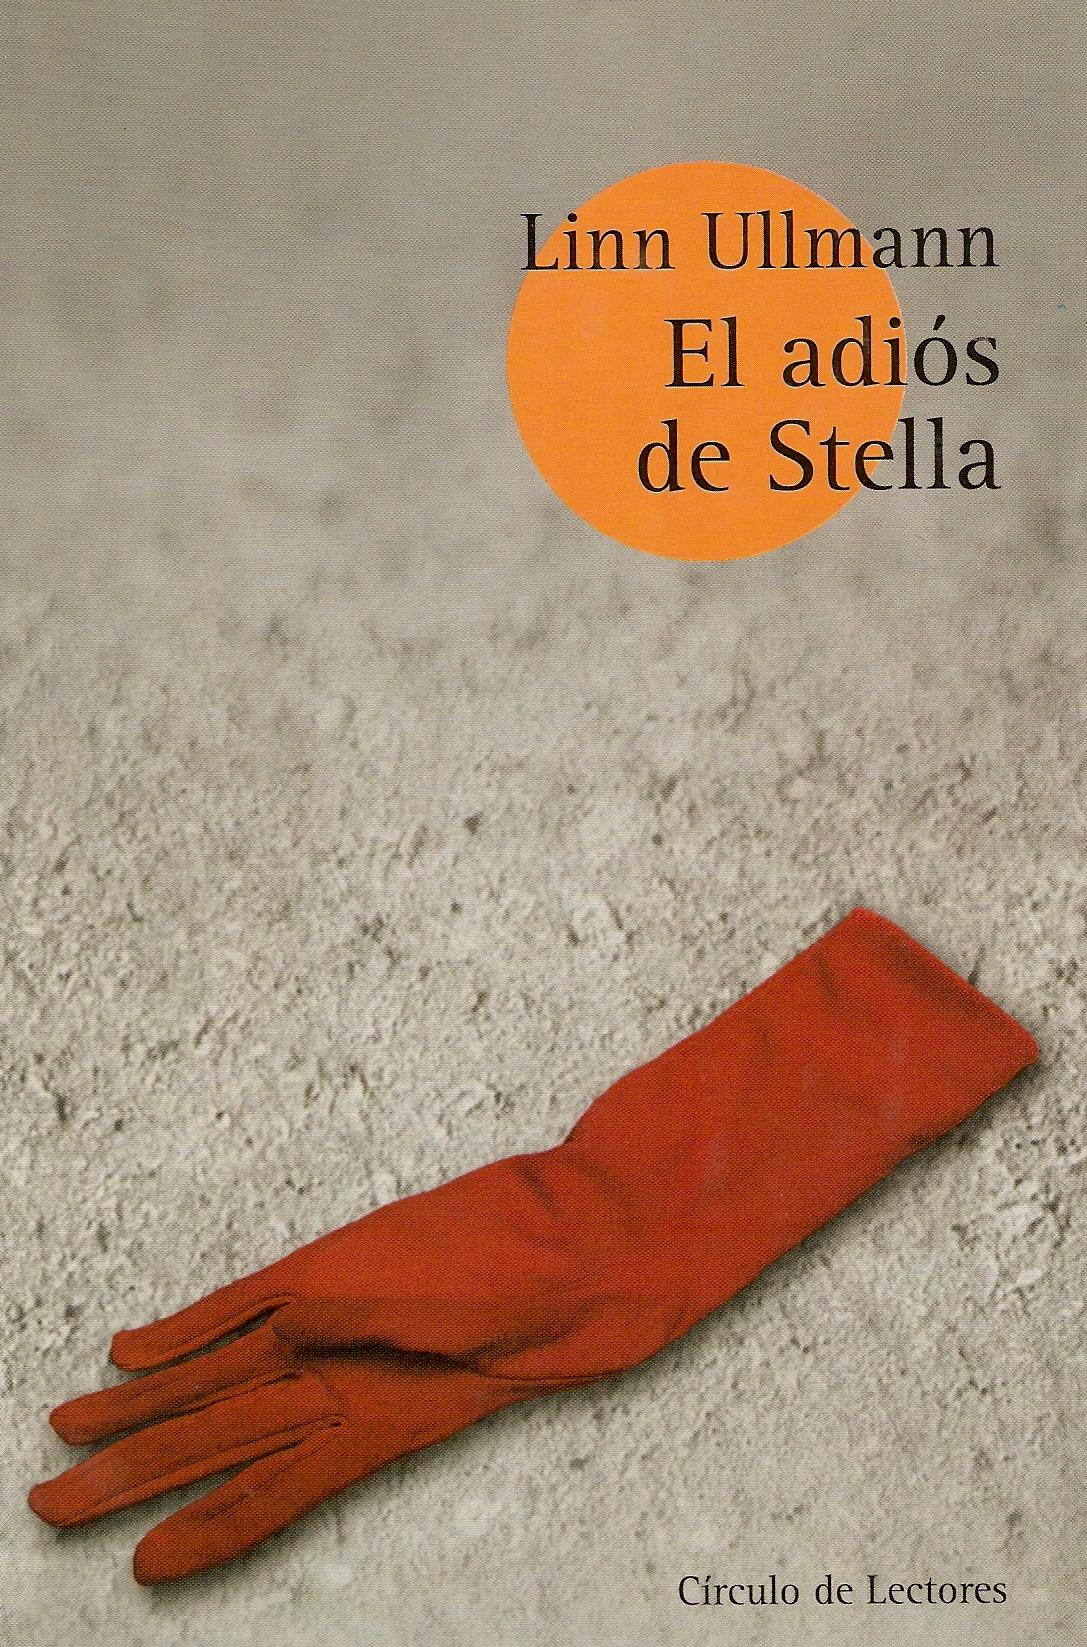 El adiós de Stella